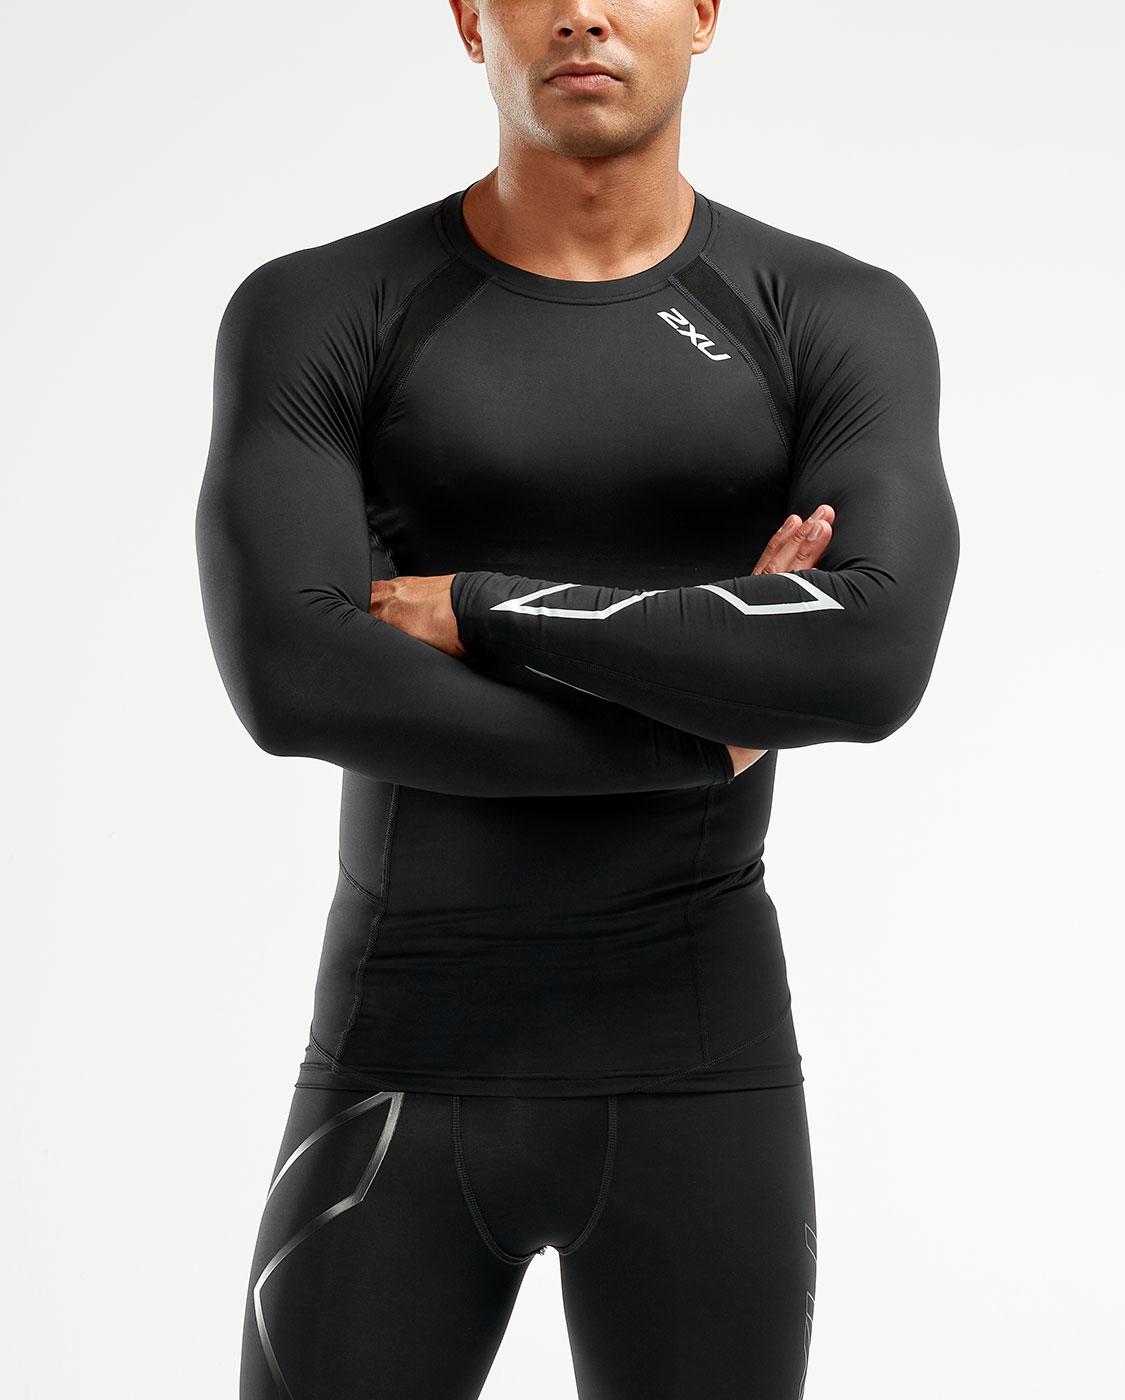 2XU Men's Compression Long Sleeve Top - Black/Silver